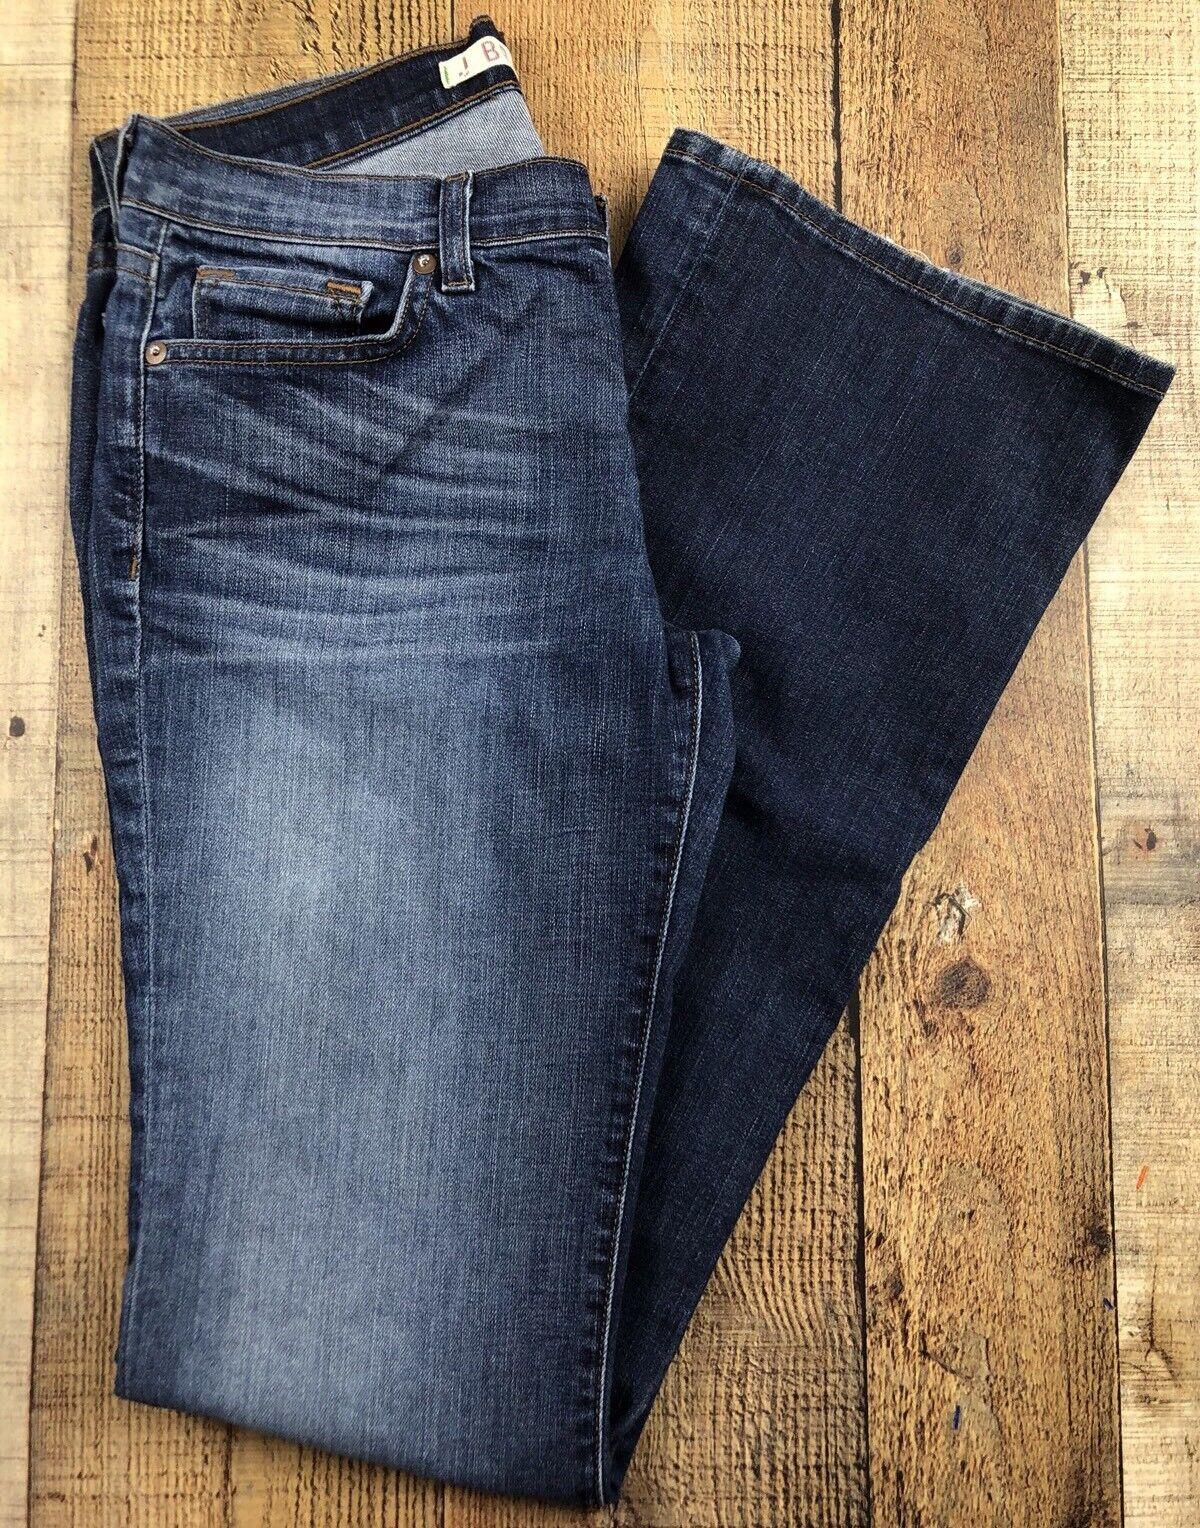 J Brand Bailey Dark Wash Boot Cut Low Rise Women's Jeans Size 27. 29x33x8